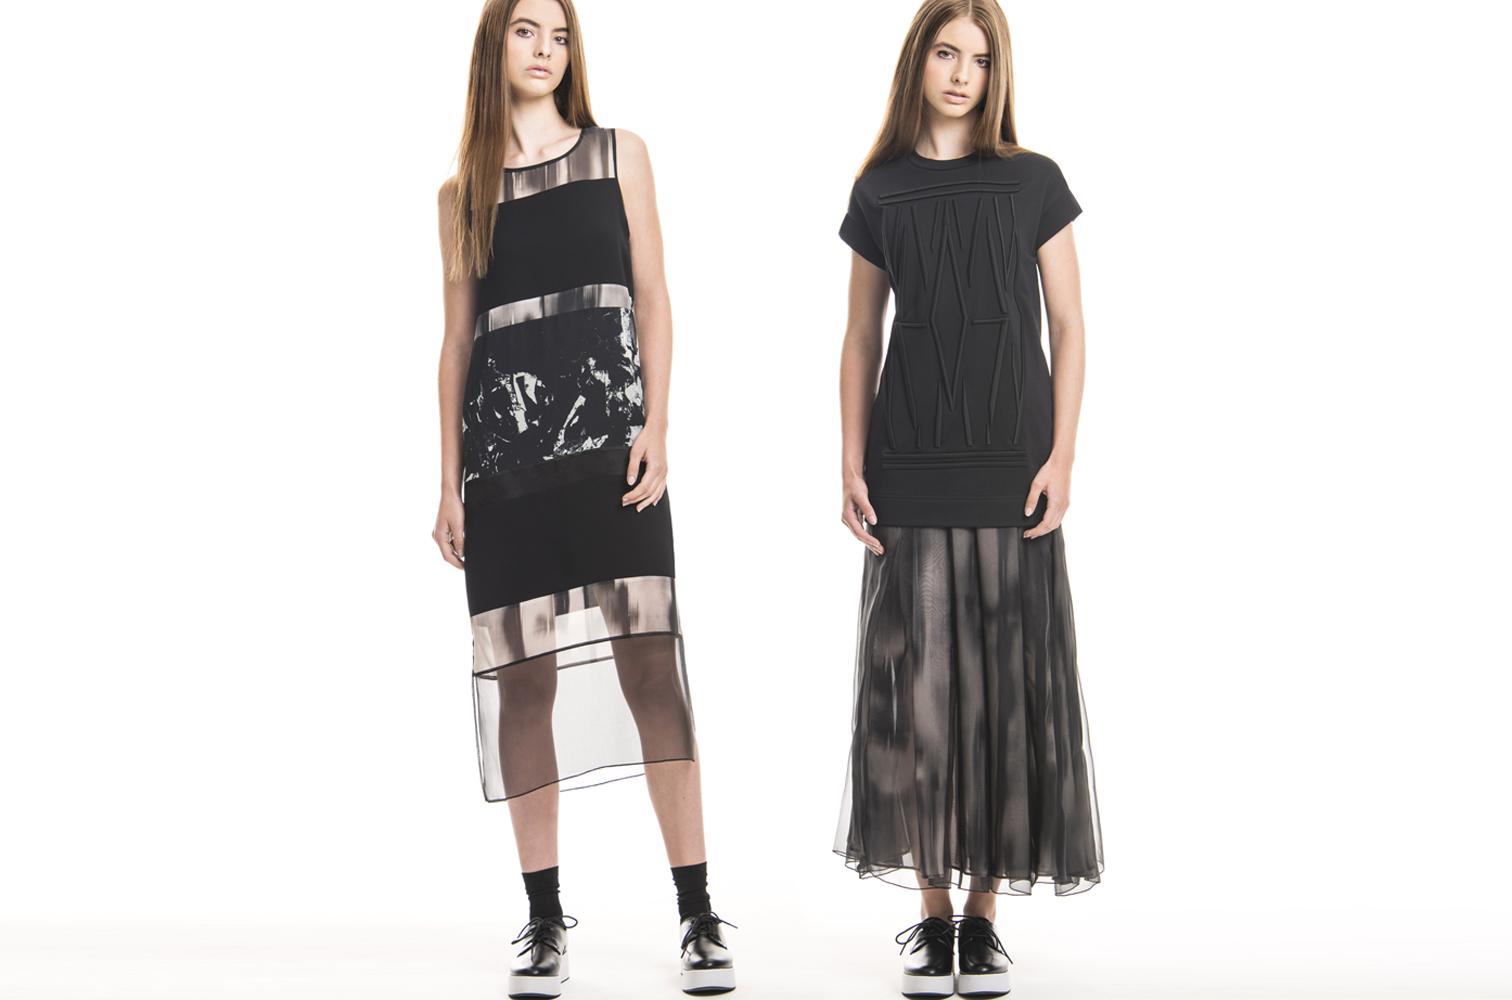 deuxa ss16 dress Desiree